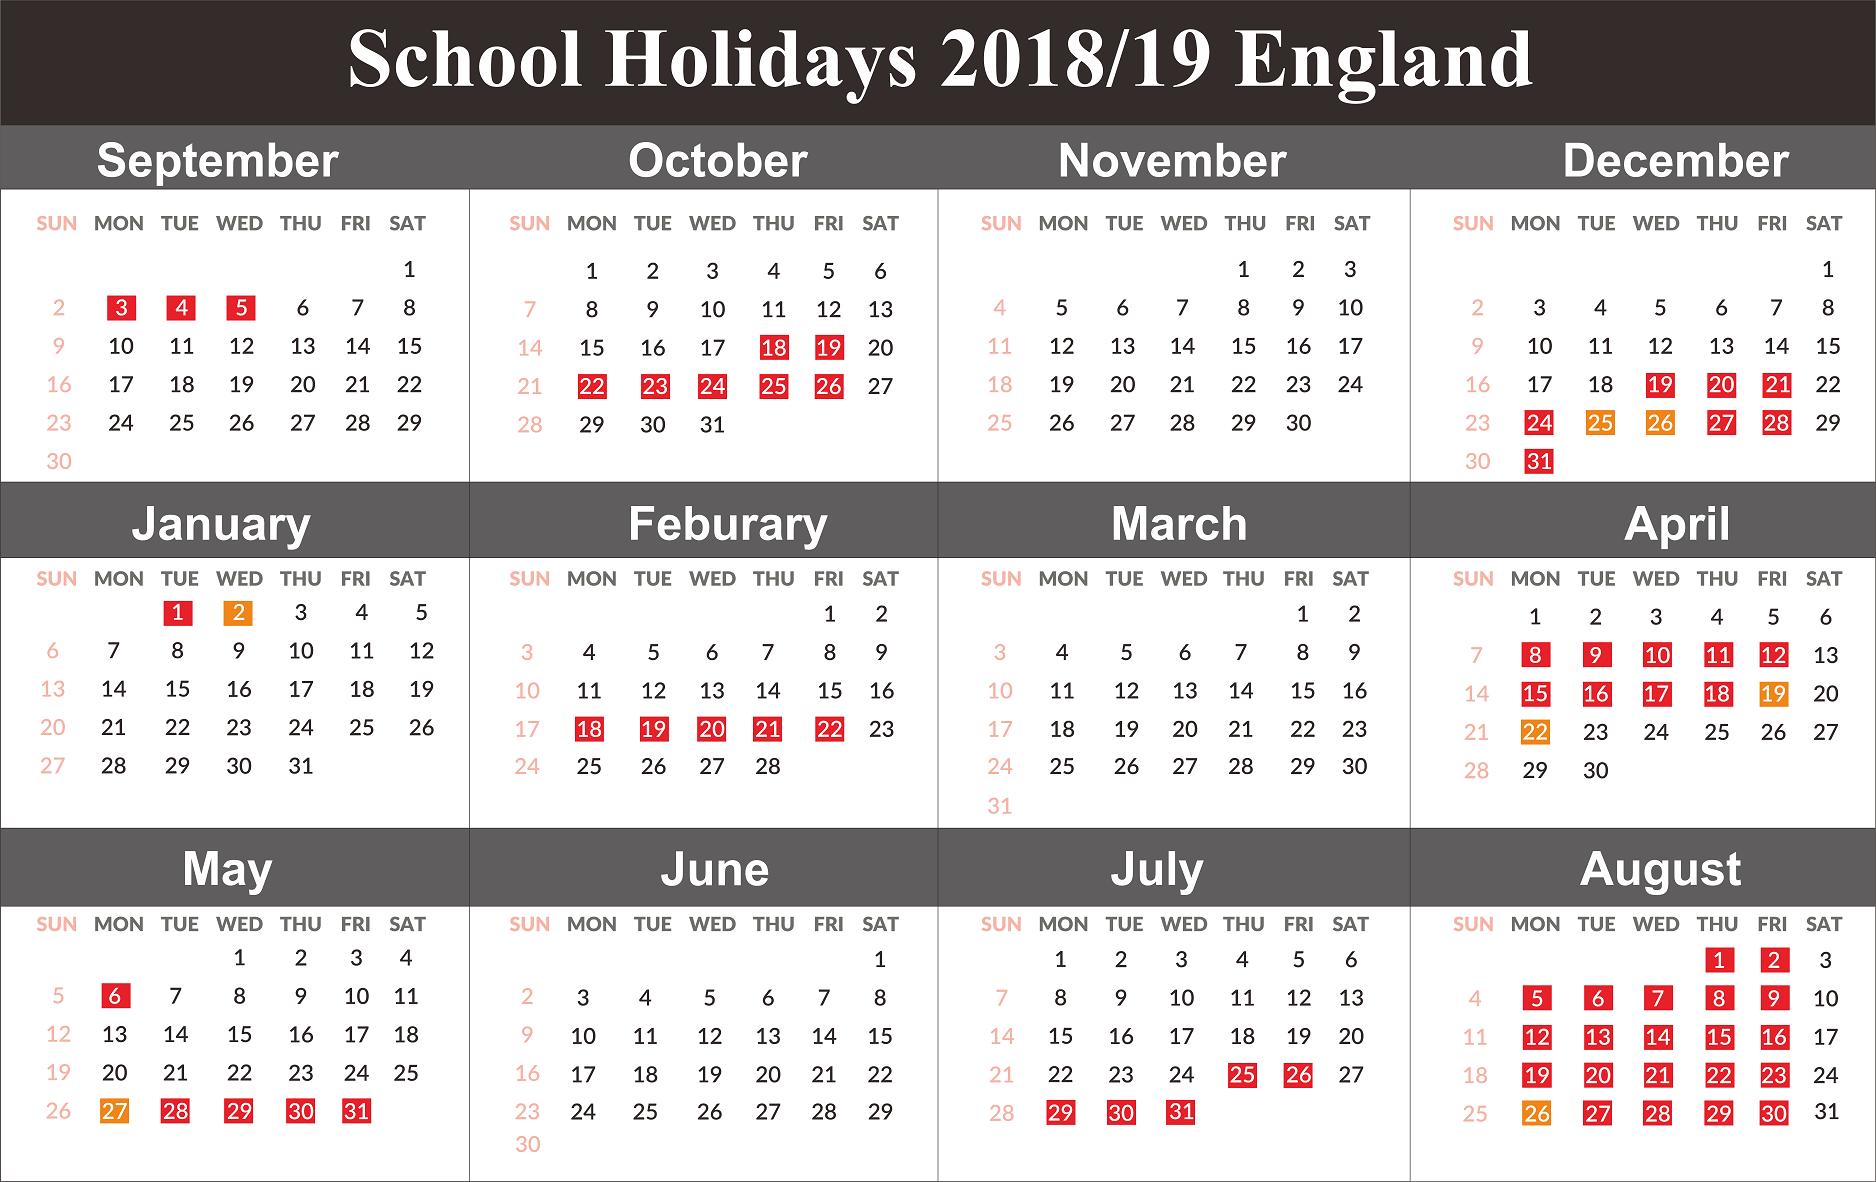 England School Holidays 2019 Dates